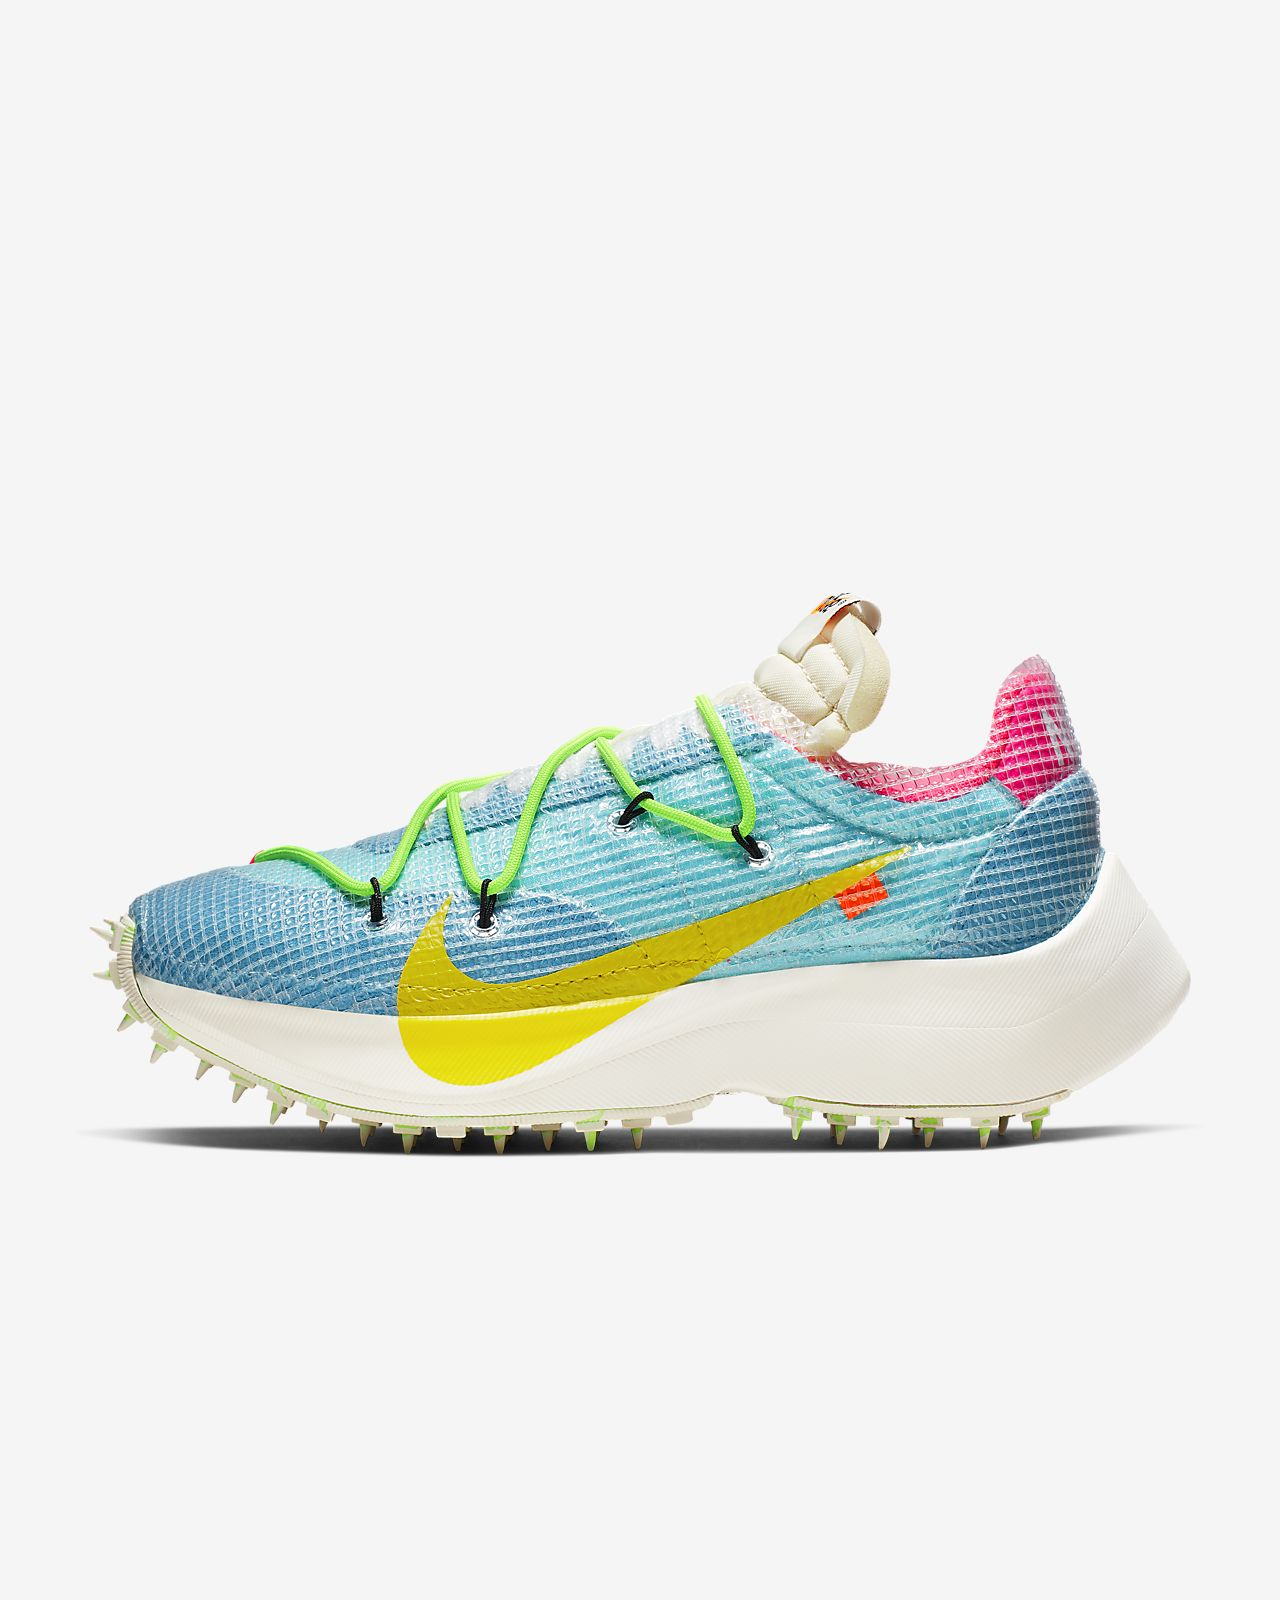 Nike x Off-White™ Vapor Street Women's Shoe